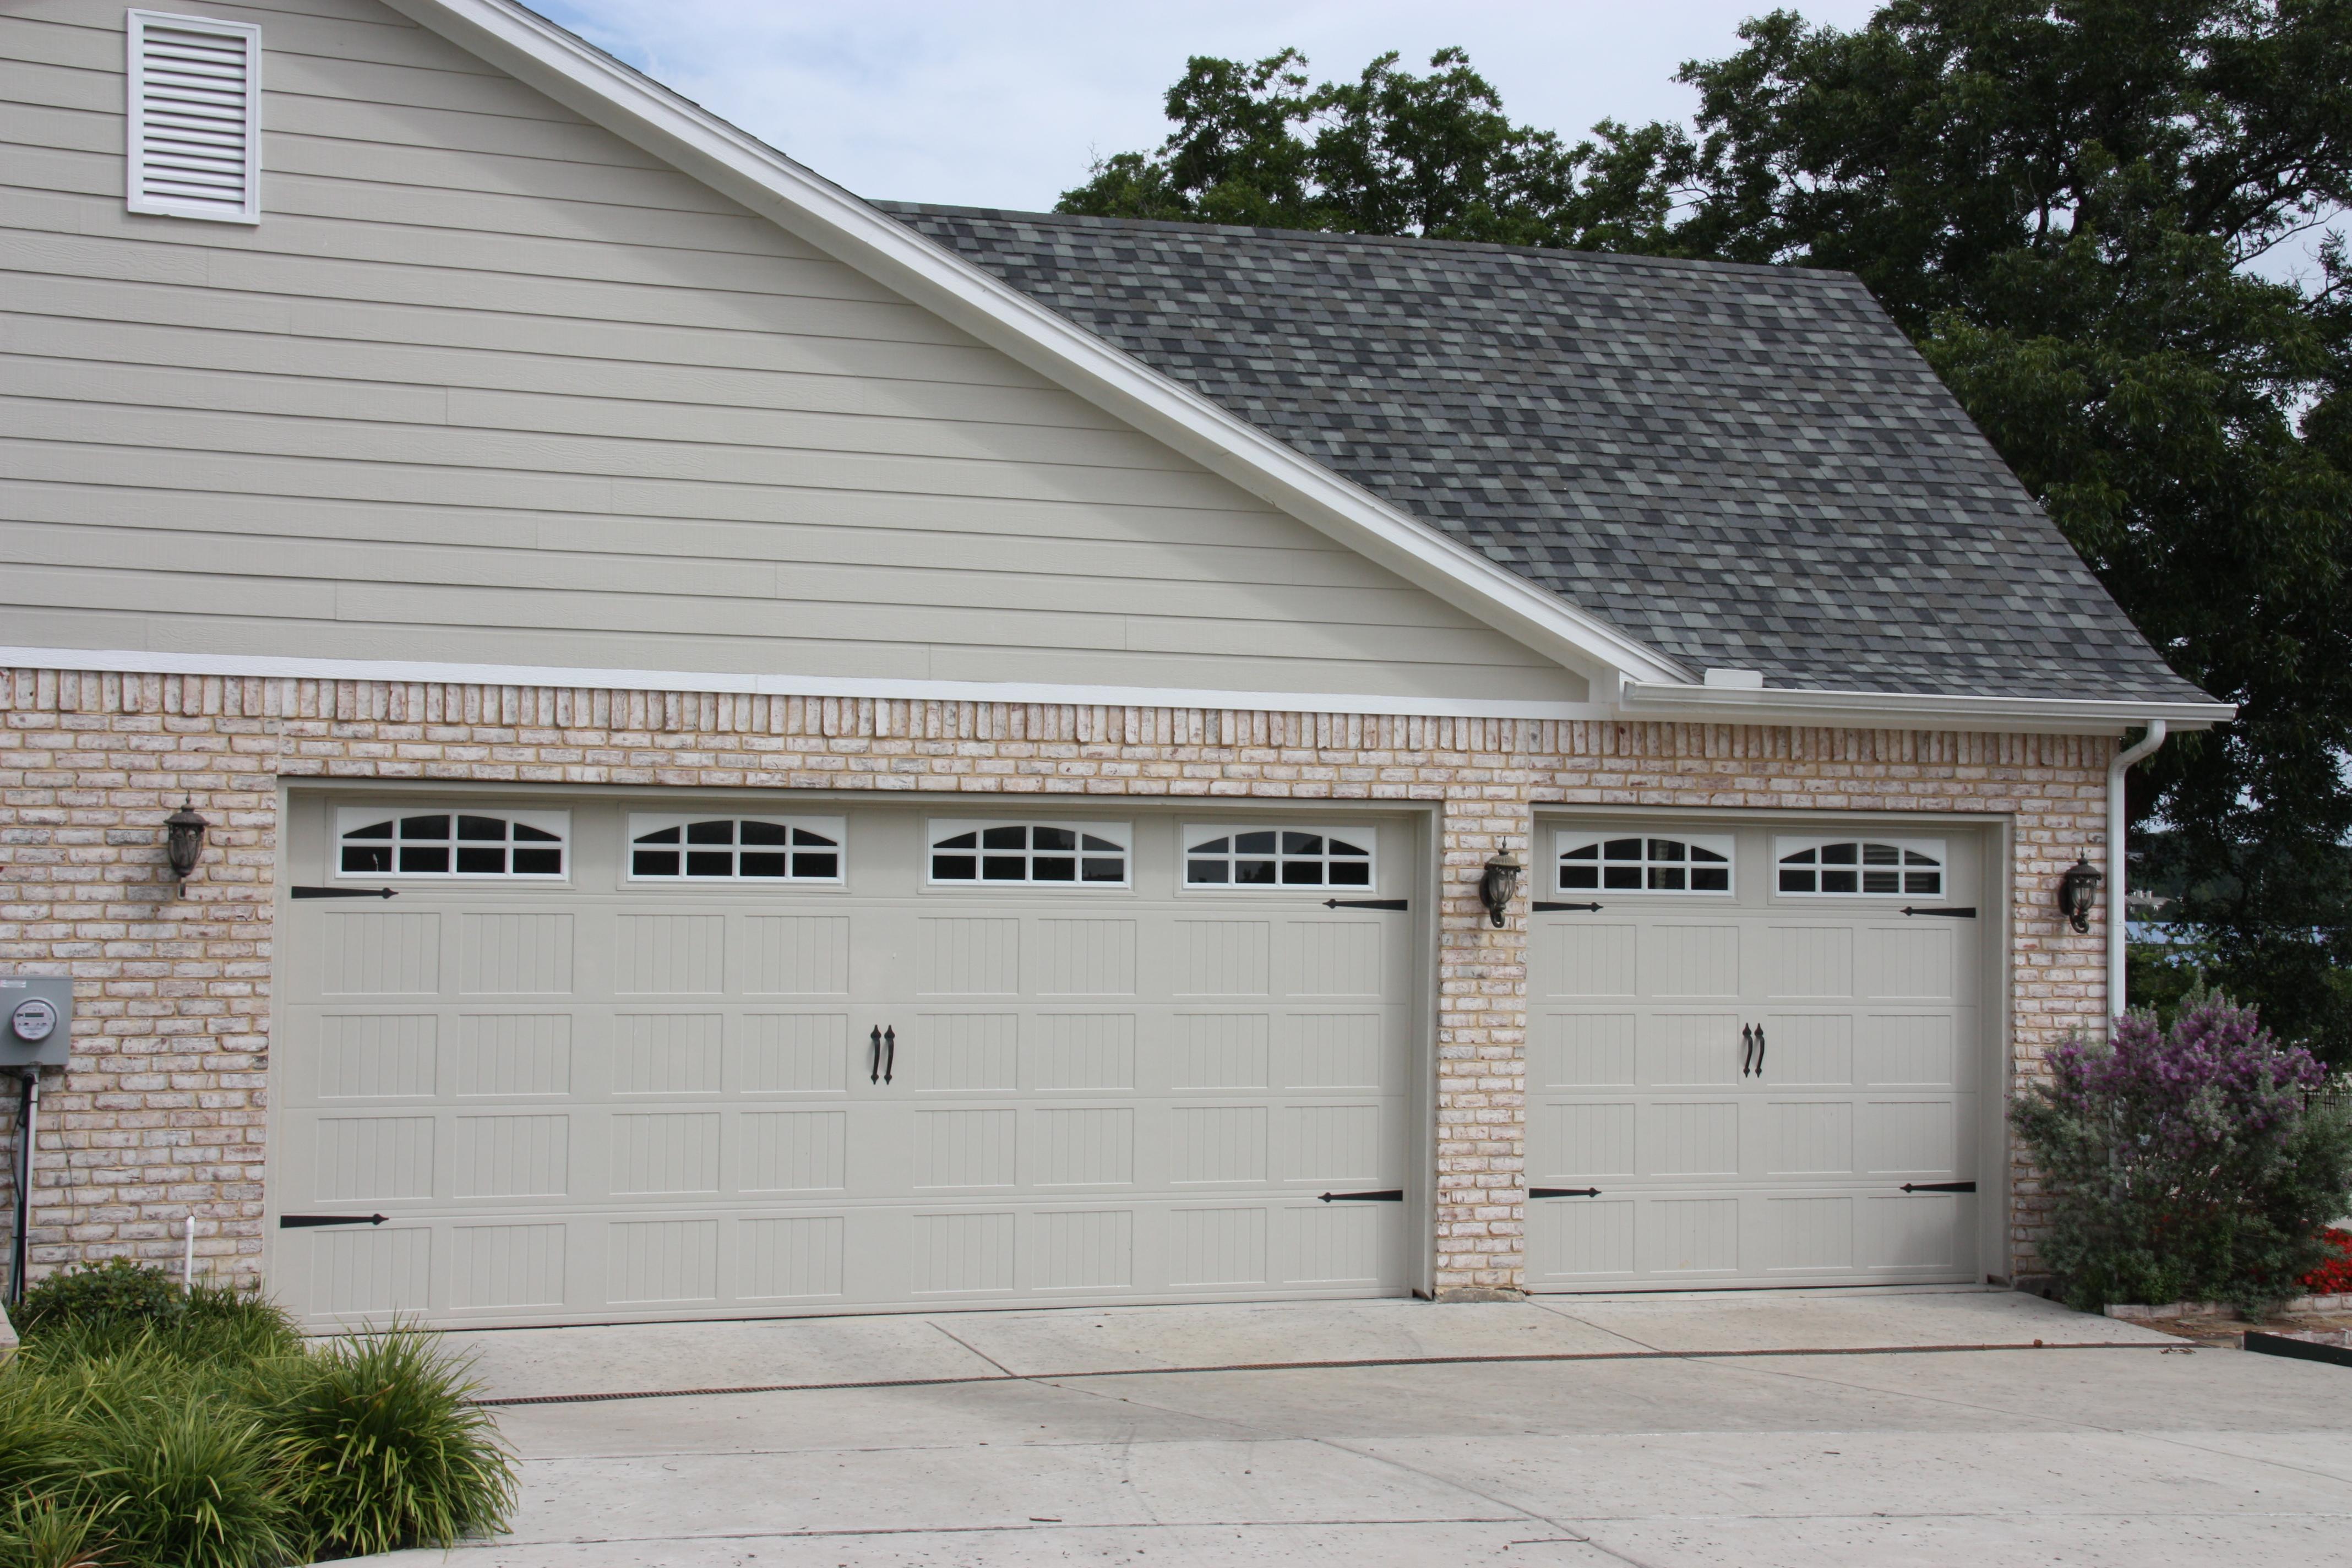 Family christian doors north richland hills tx 76180 for 18x8 garage door